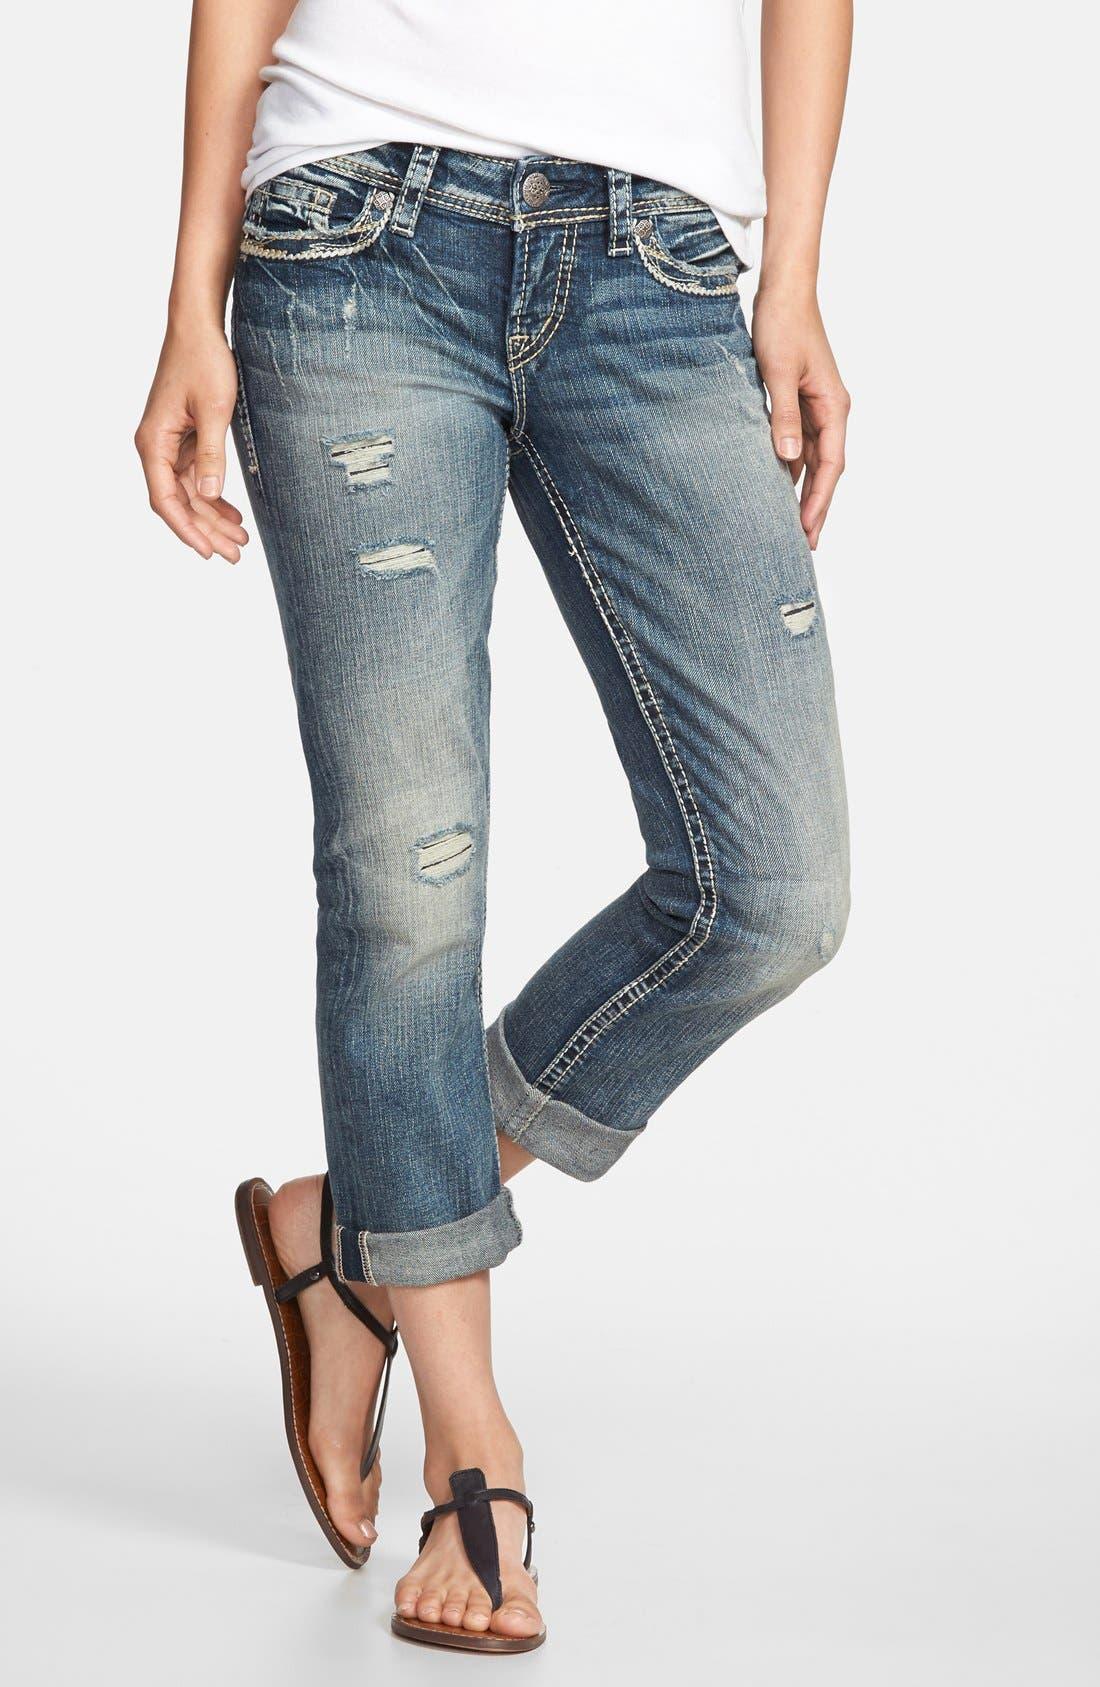 Silver Jeans Co. 'Suki' Curvy Fit Distressed Cuffed Capri Jeans ...